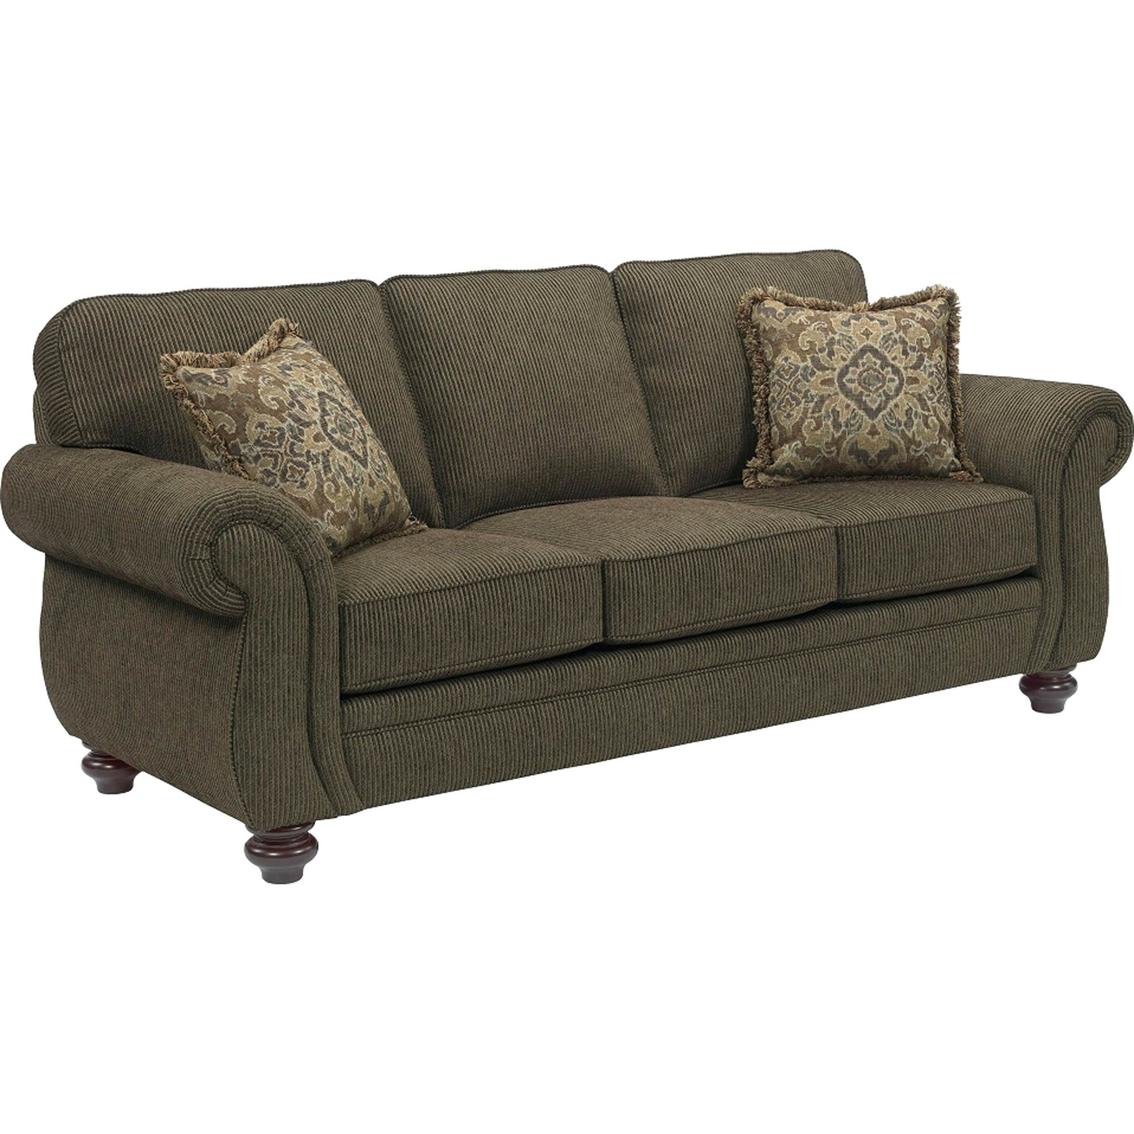 - Broyhill Cassandra Queen Sofa Sleeper Sofas & Couches